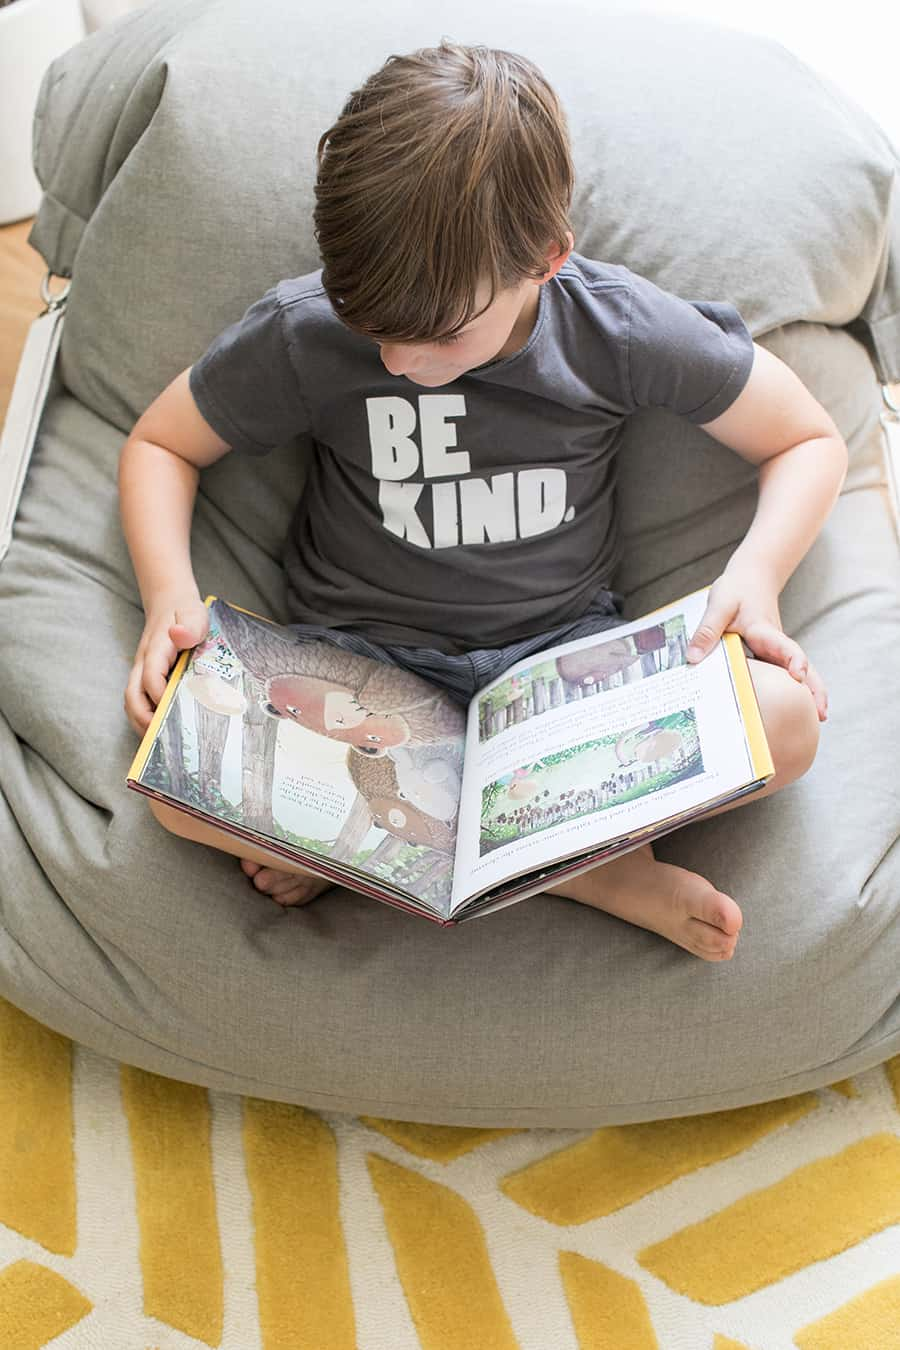 Little boy in a beanbag chair reading a book.